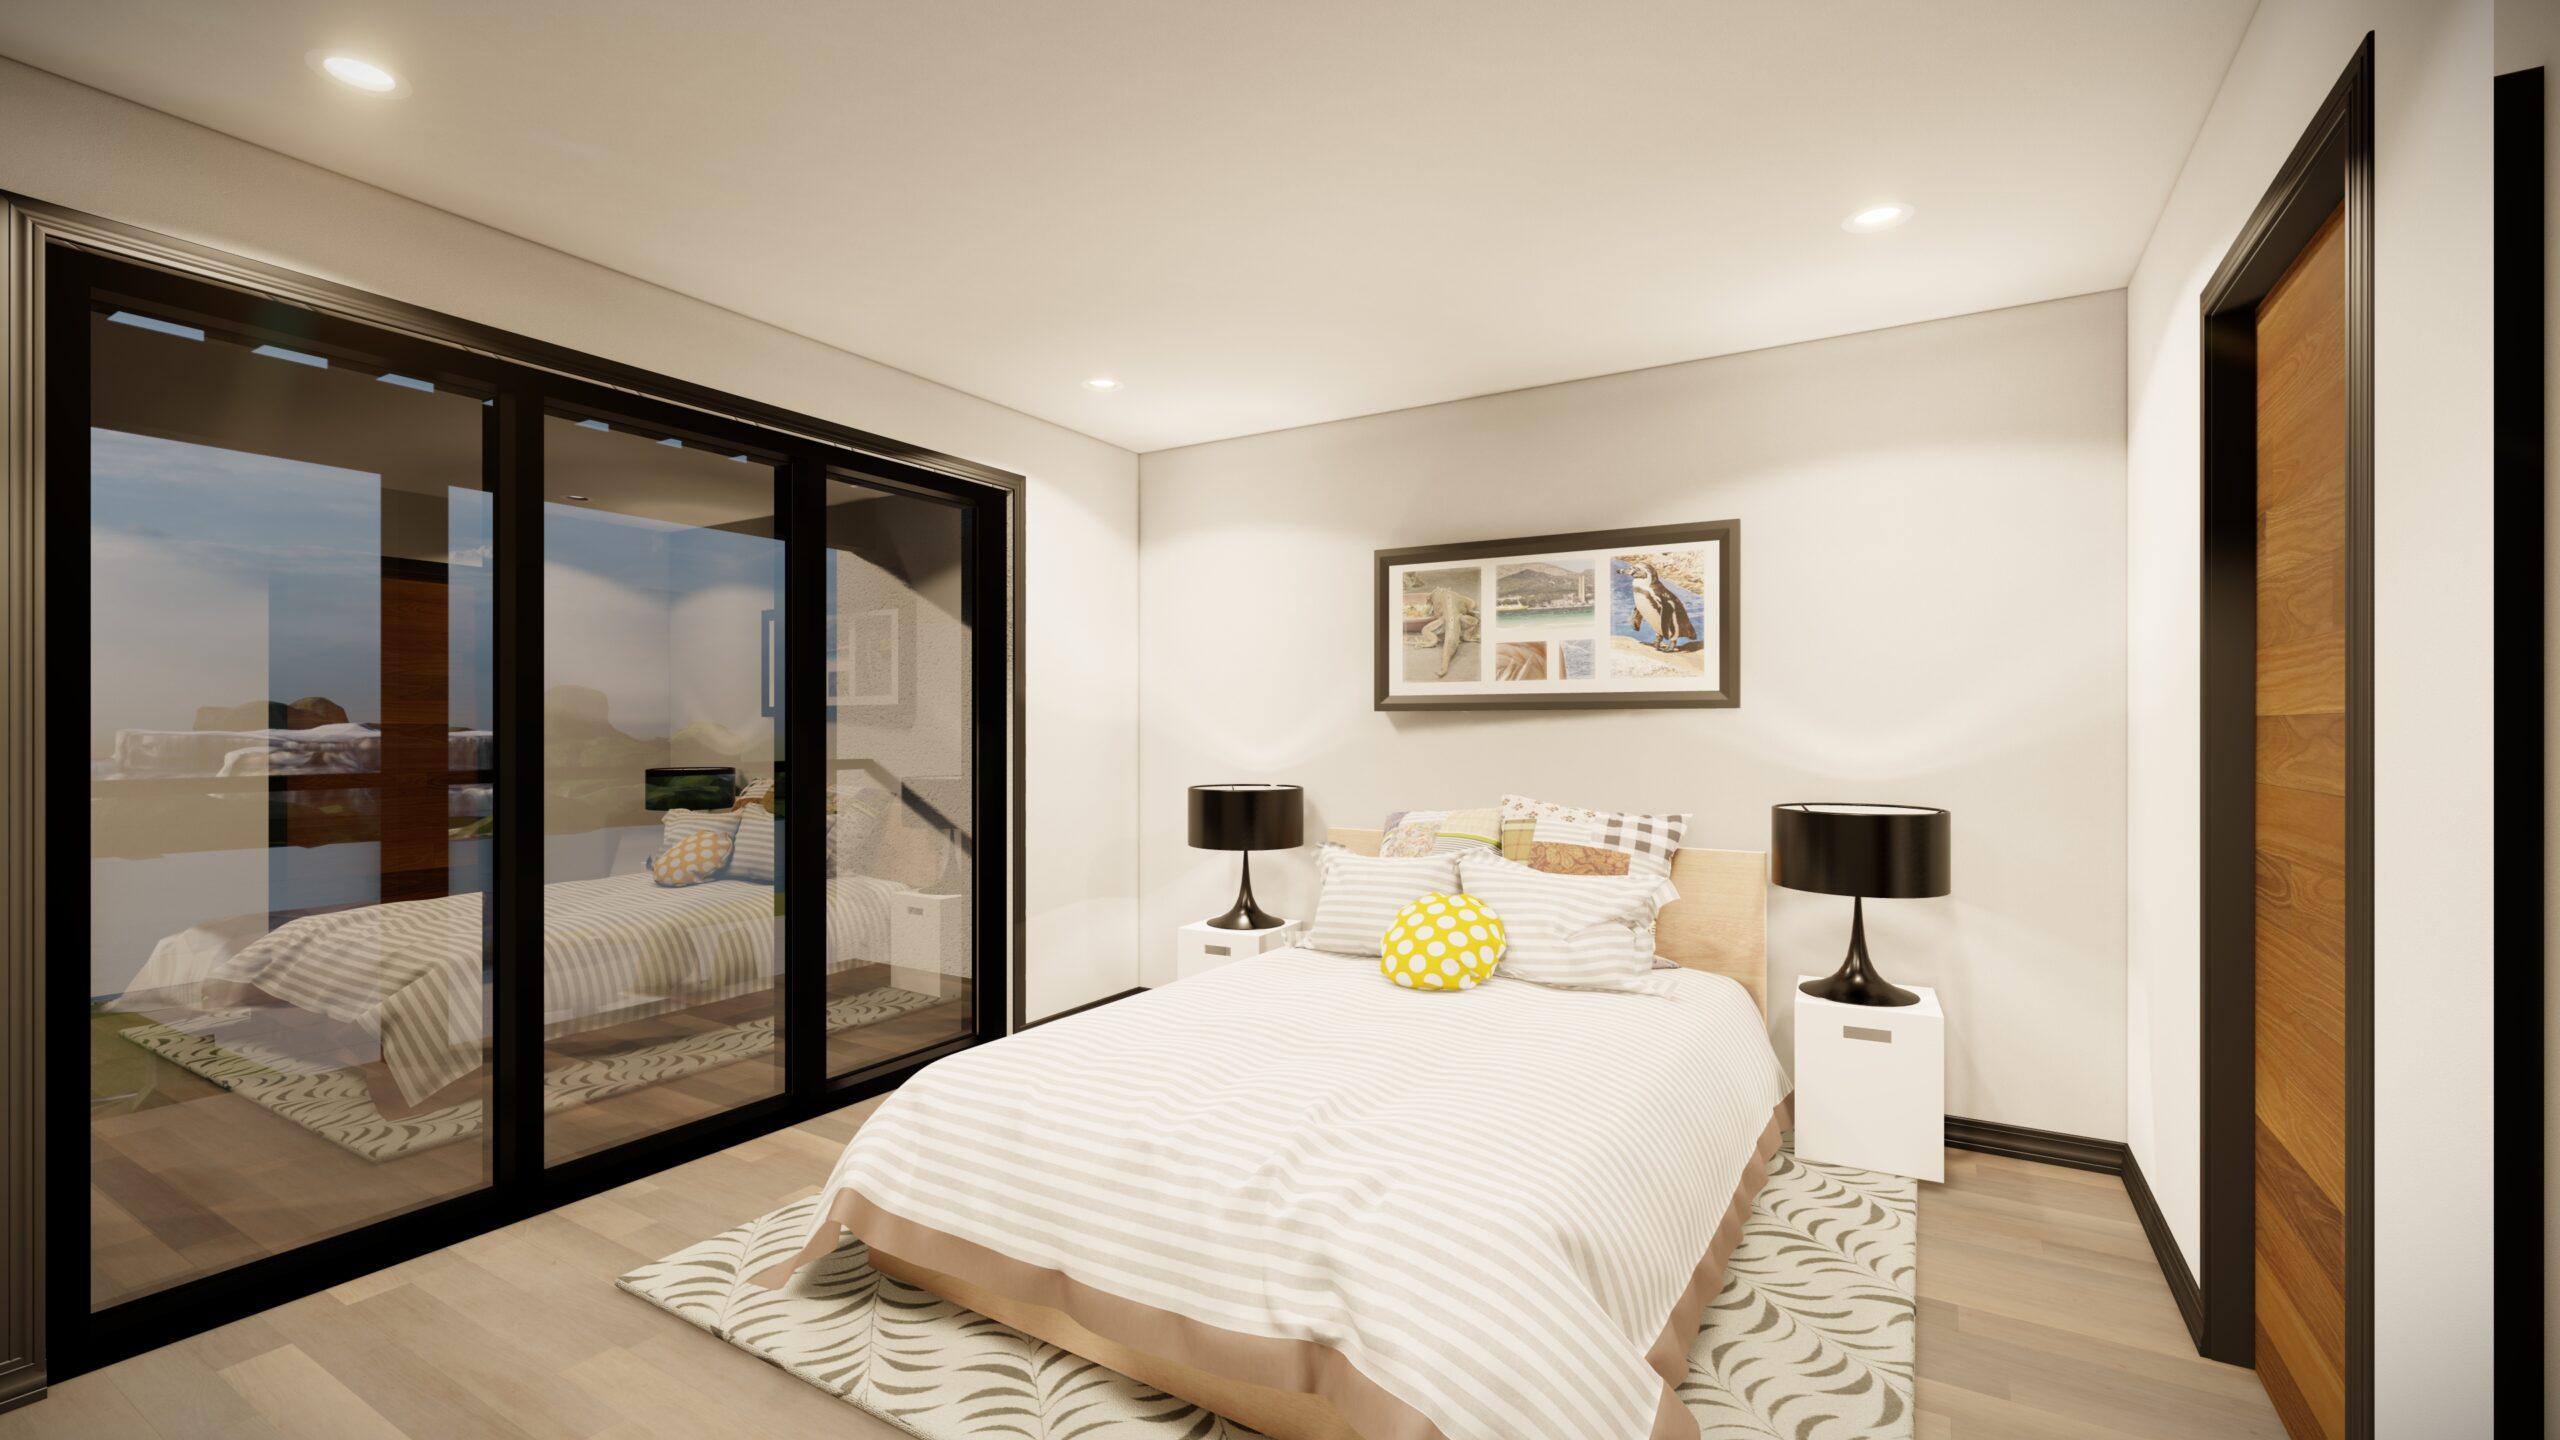 Master bedroom bed with large window Kingsbury Village Sheboygan